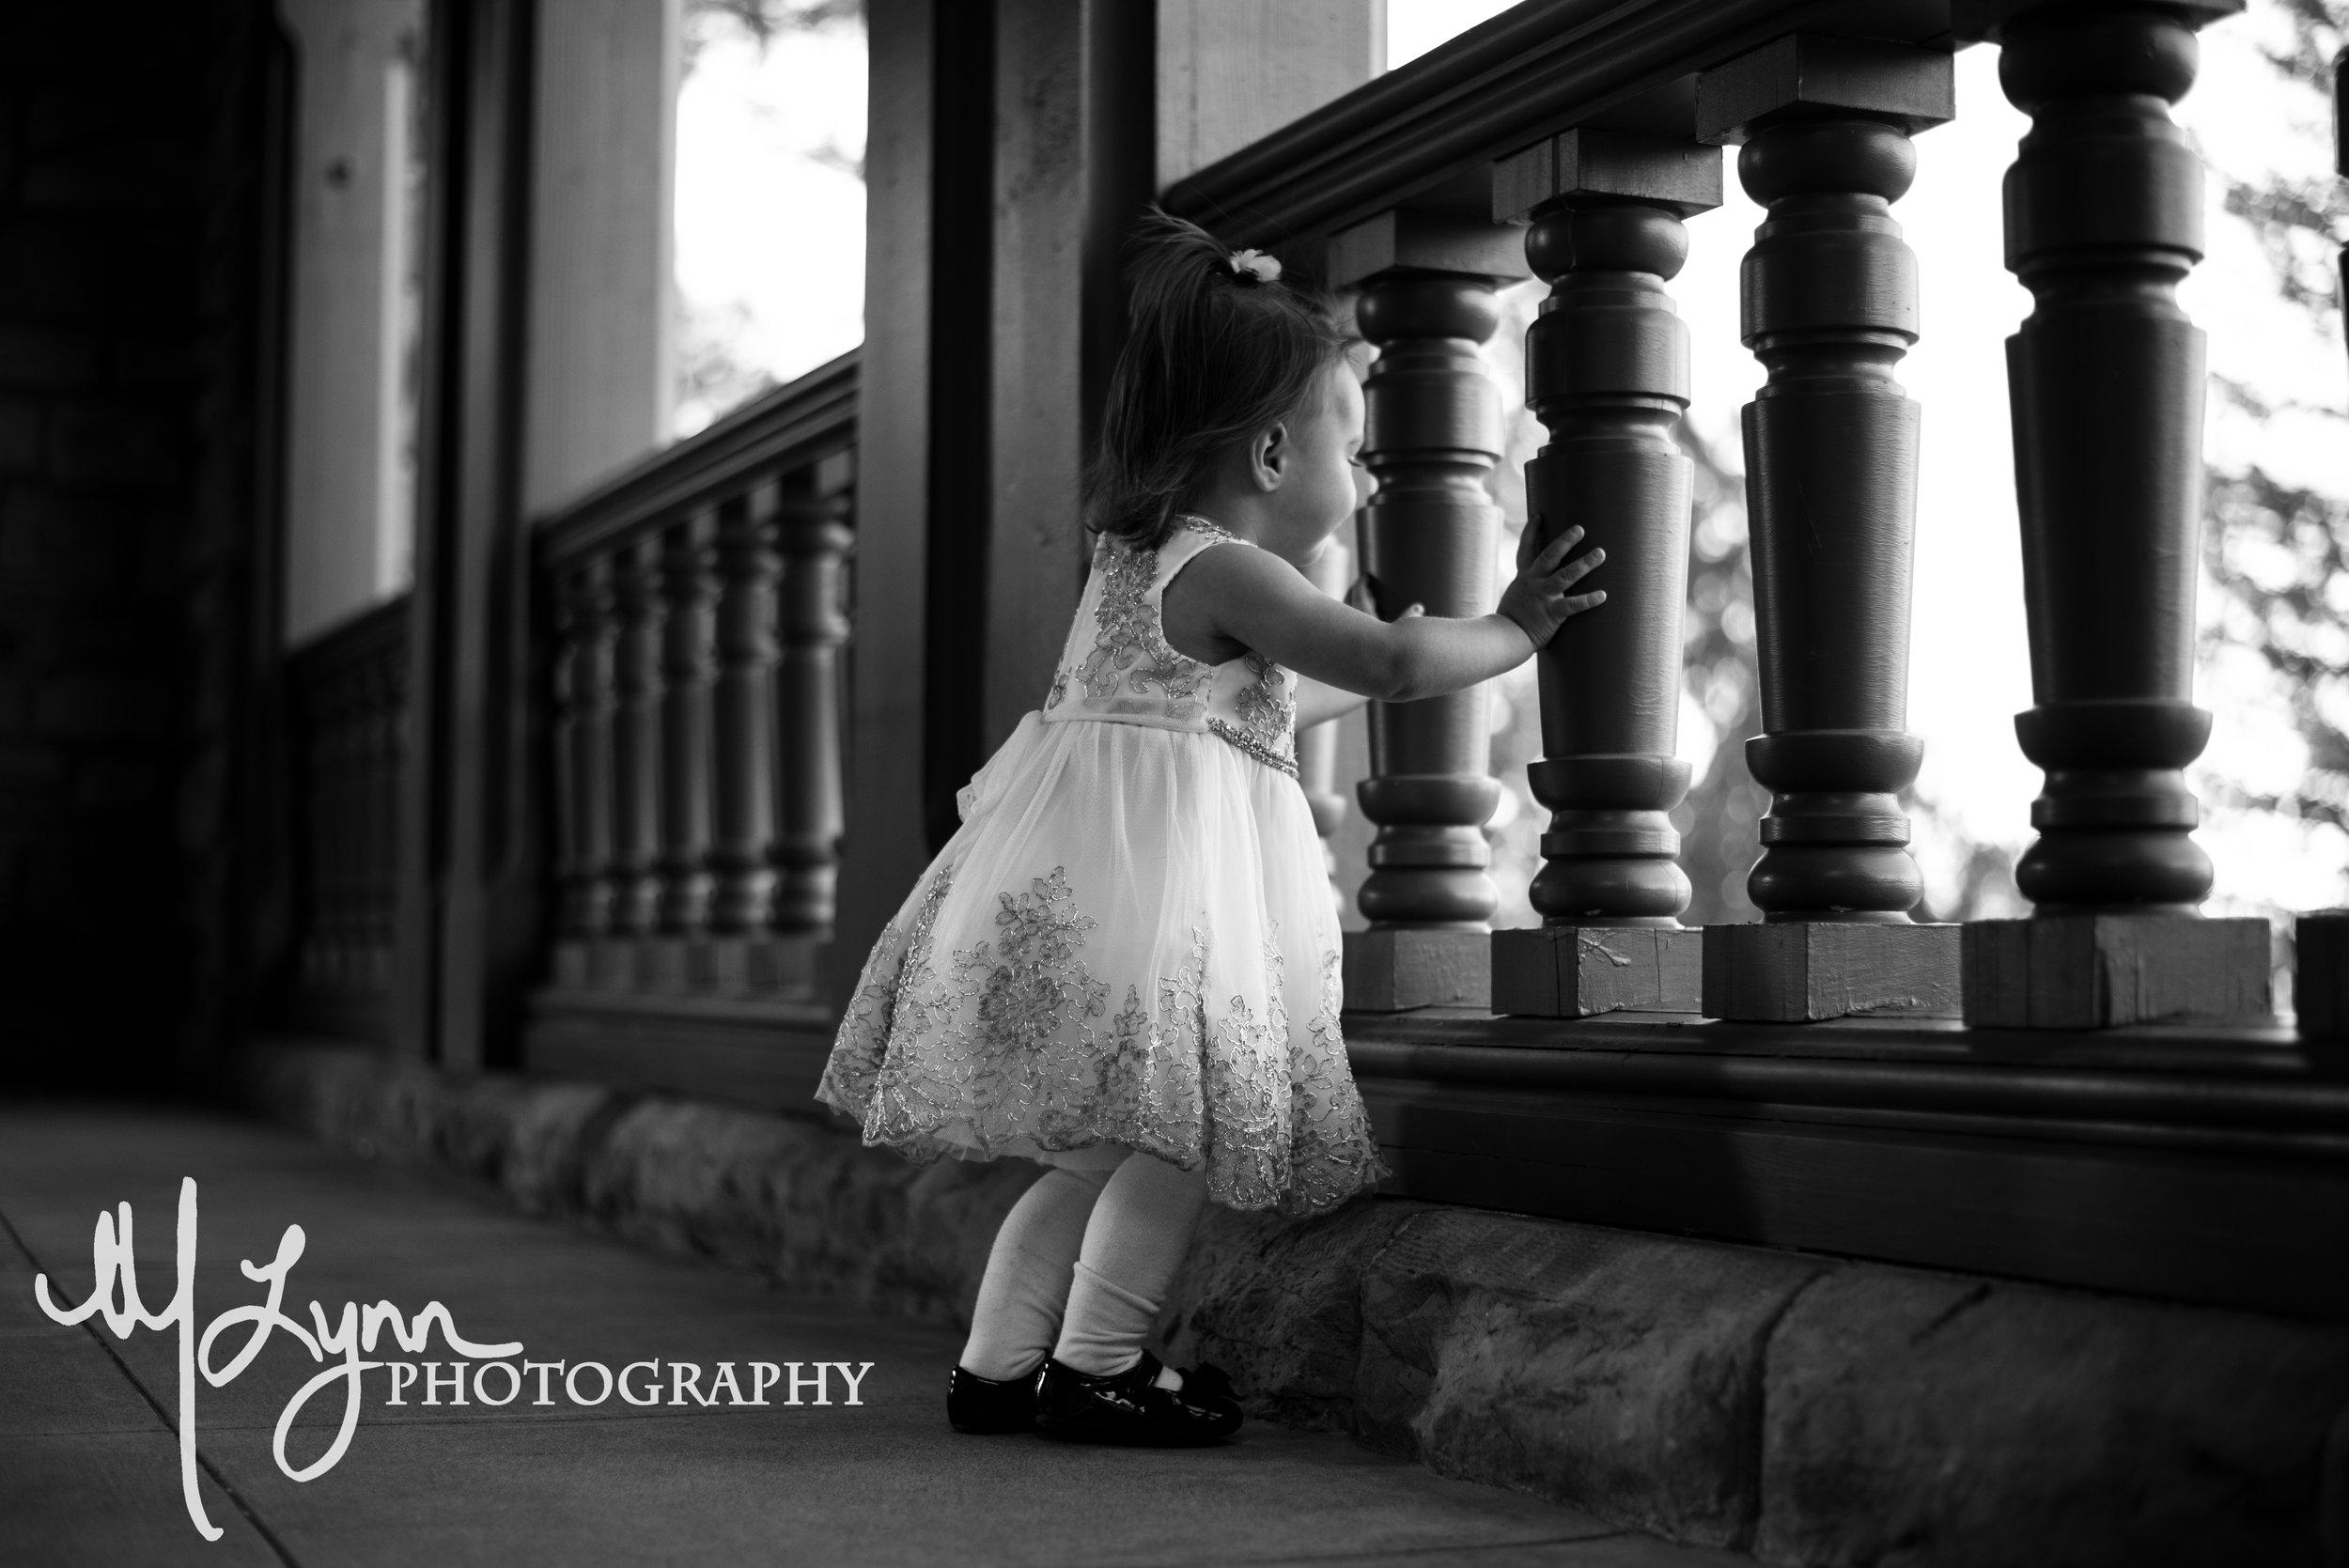 little princess dress black and white 5824.jpg